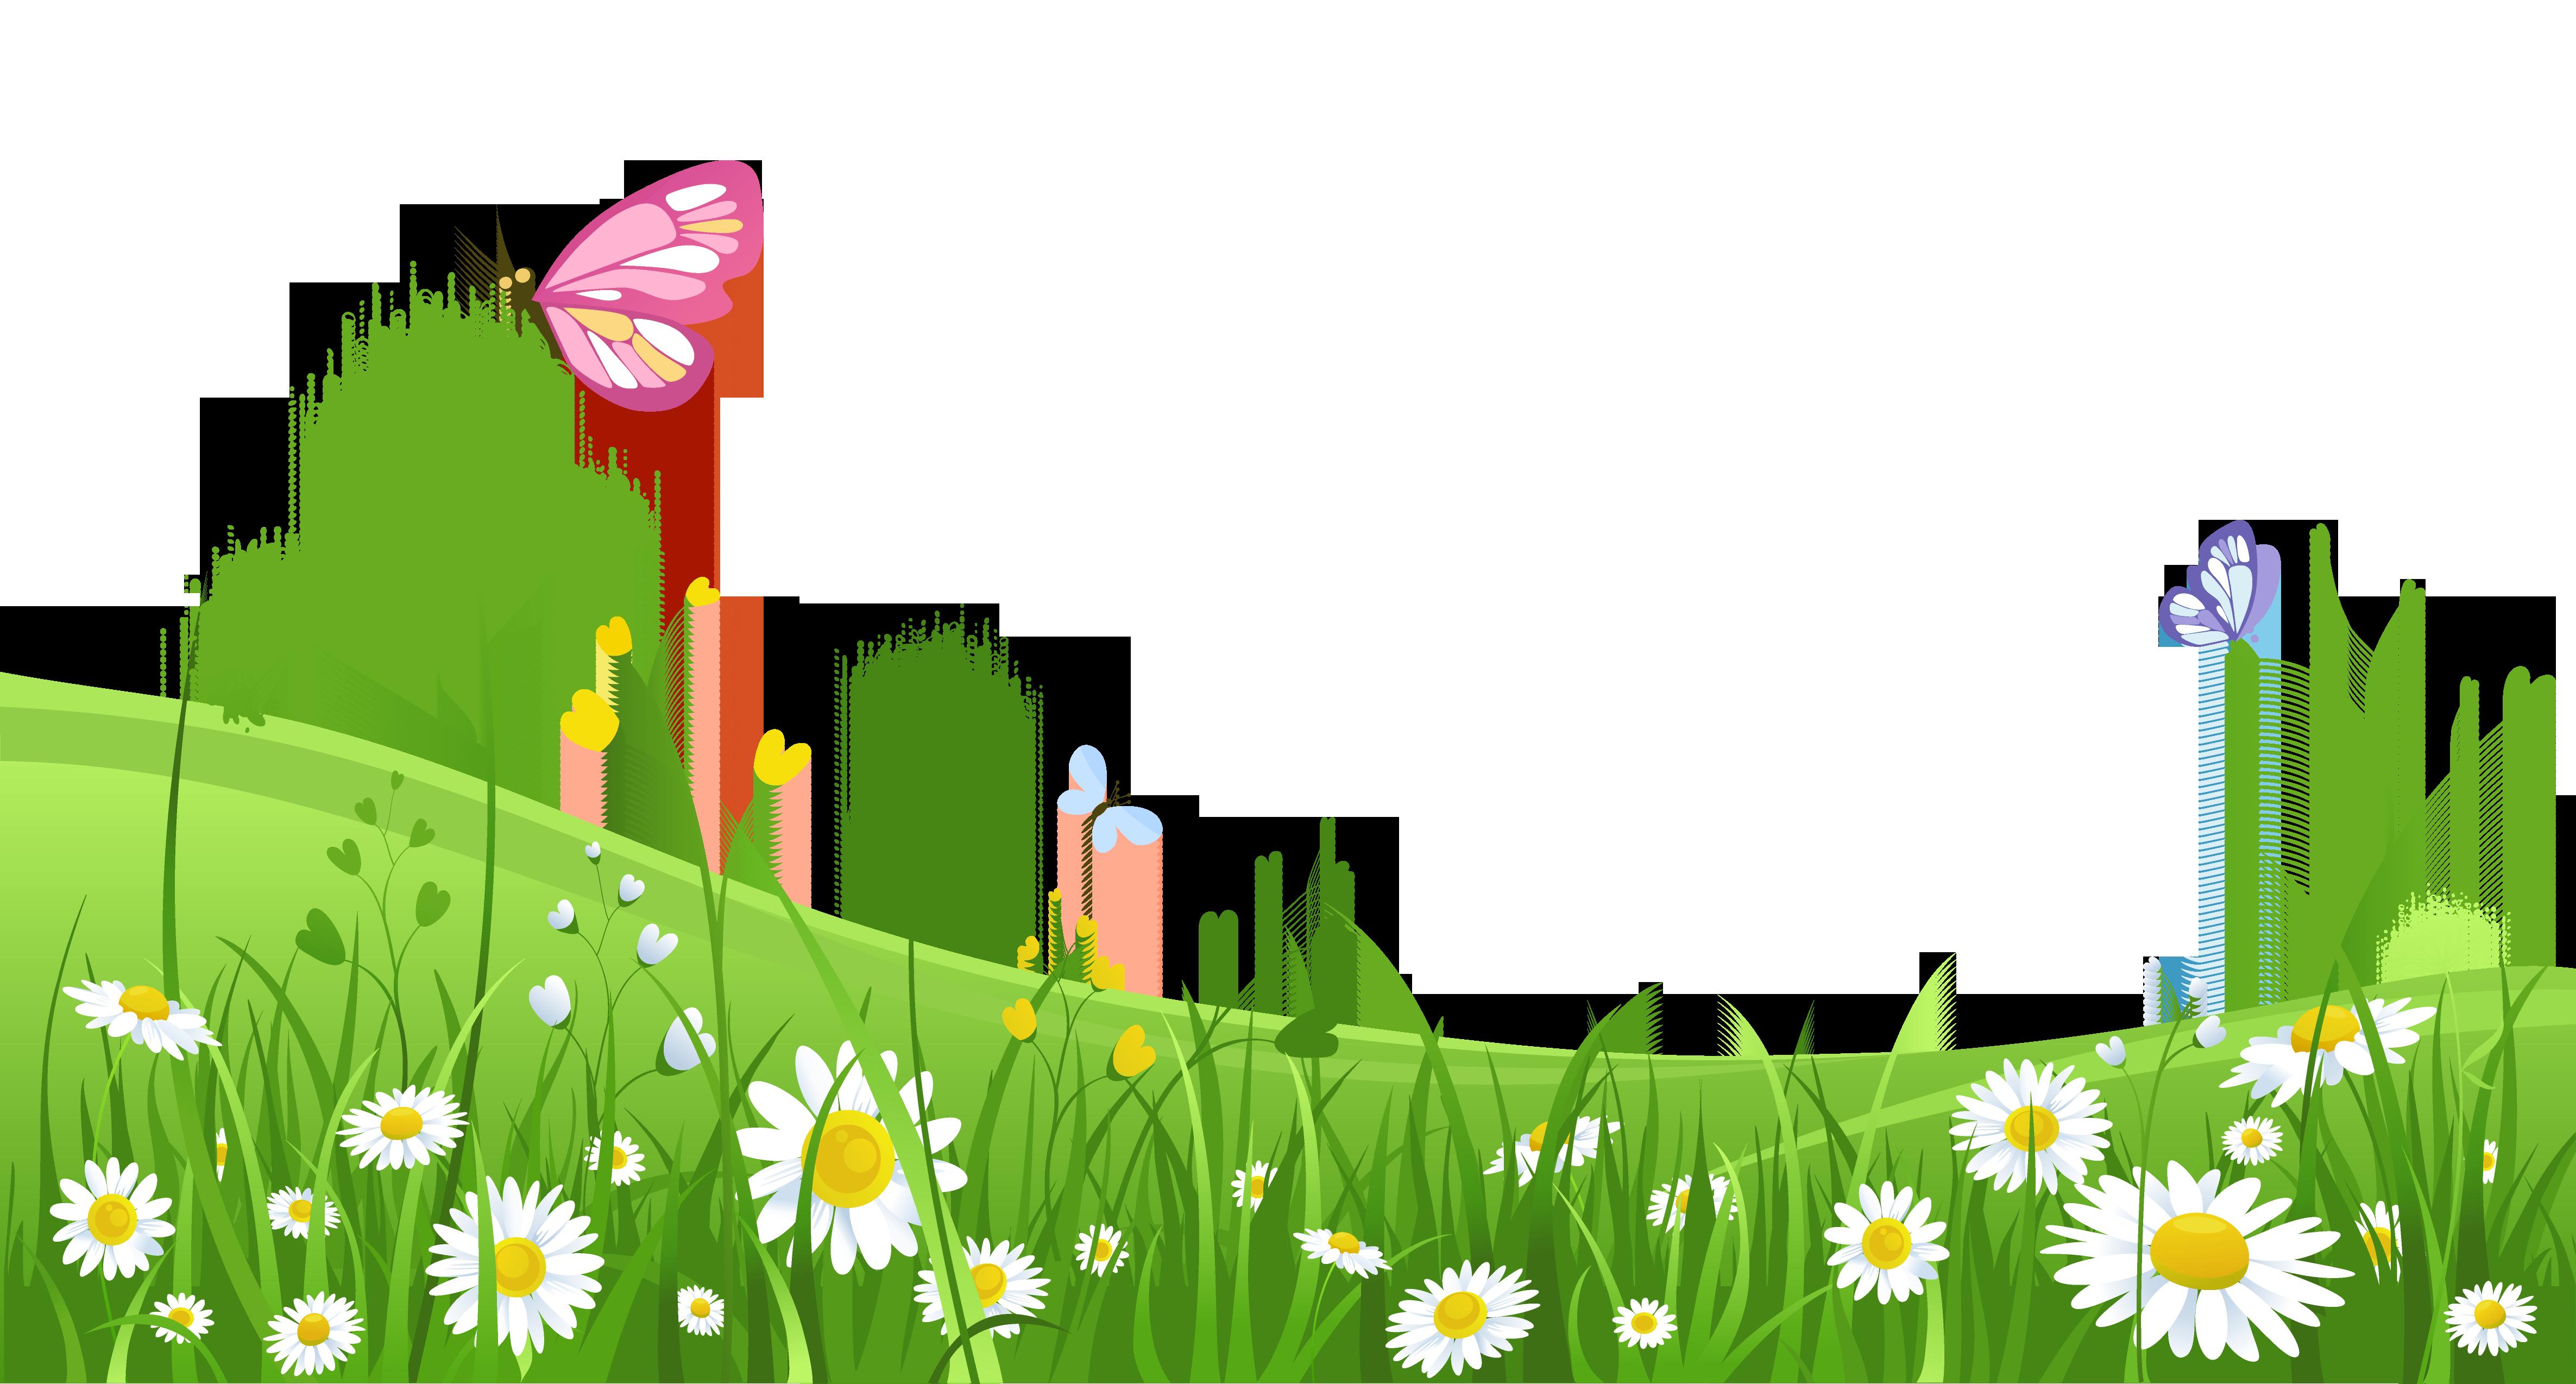 Clipart grass background.